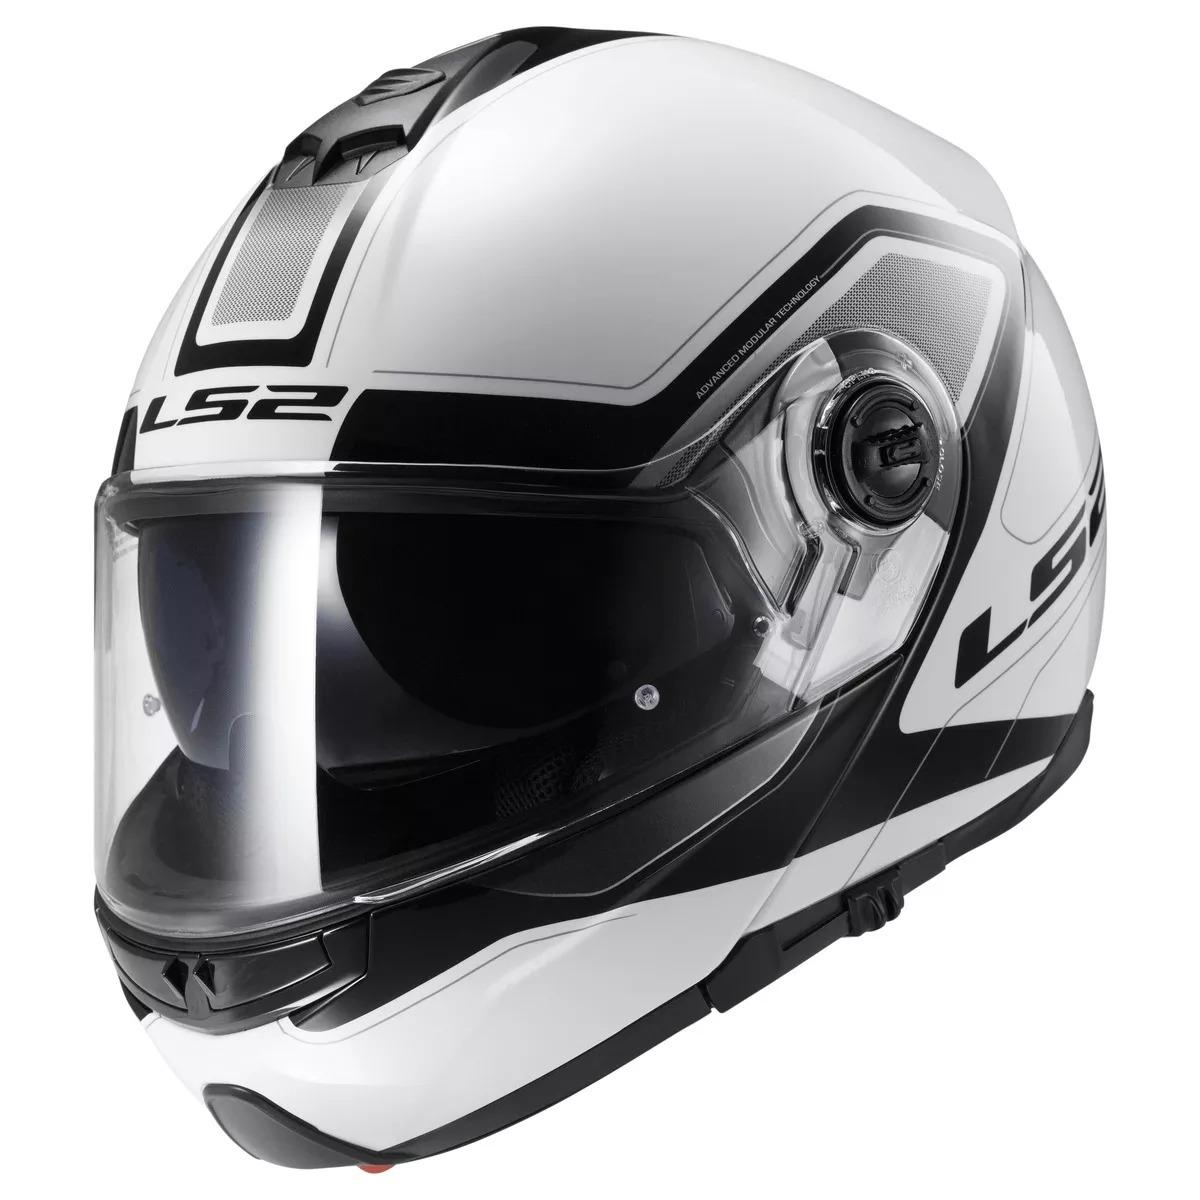 casco ls2 325 strobe civik blanco talle l (59-60cm)